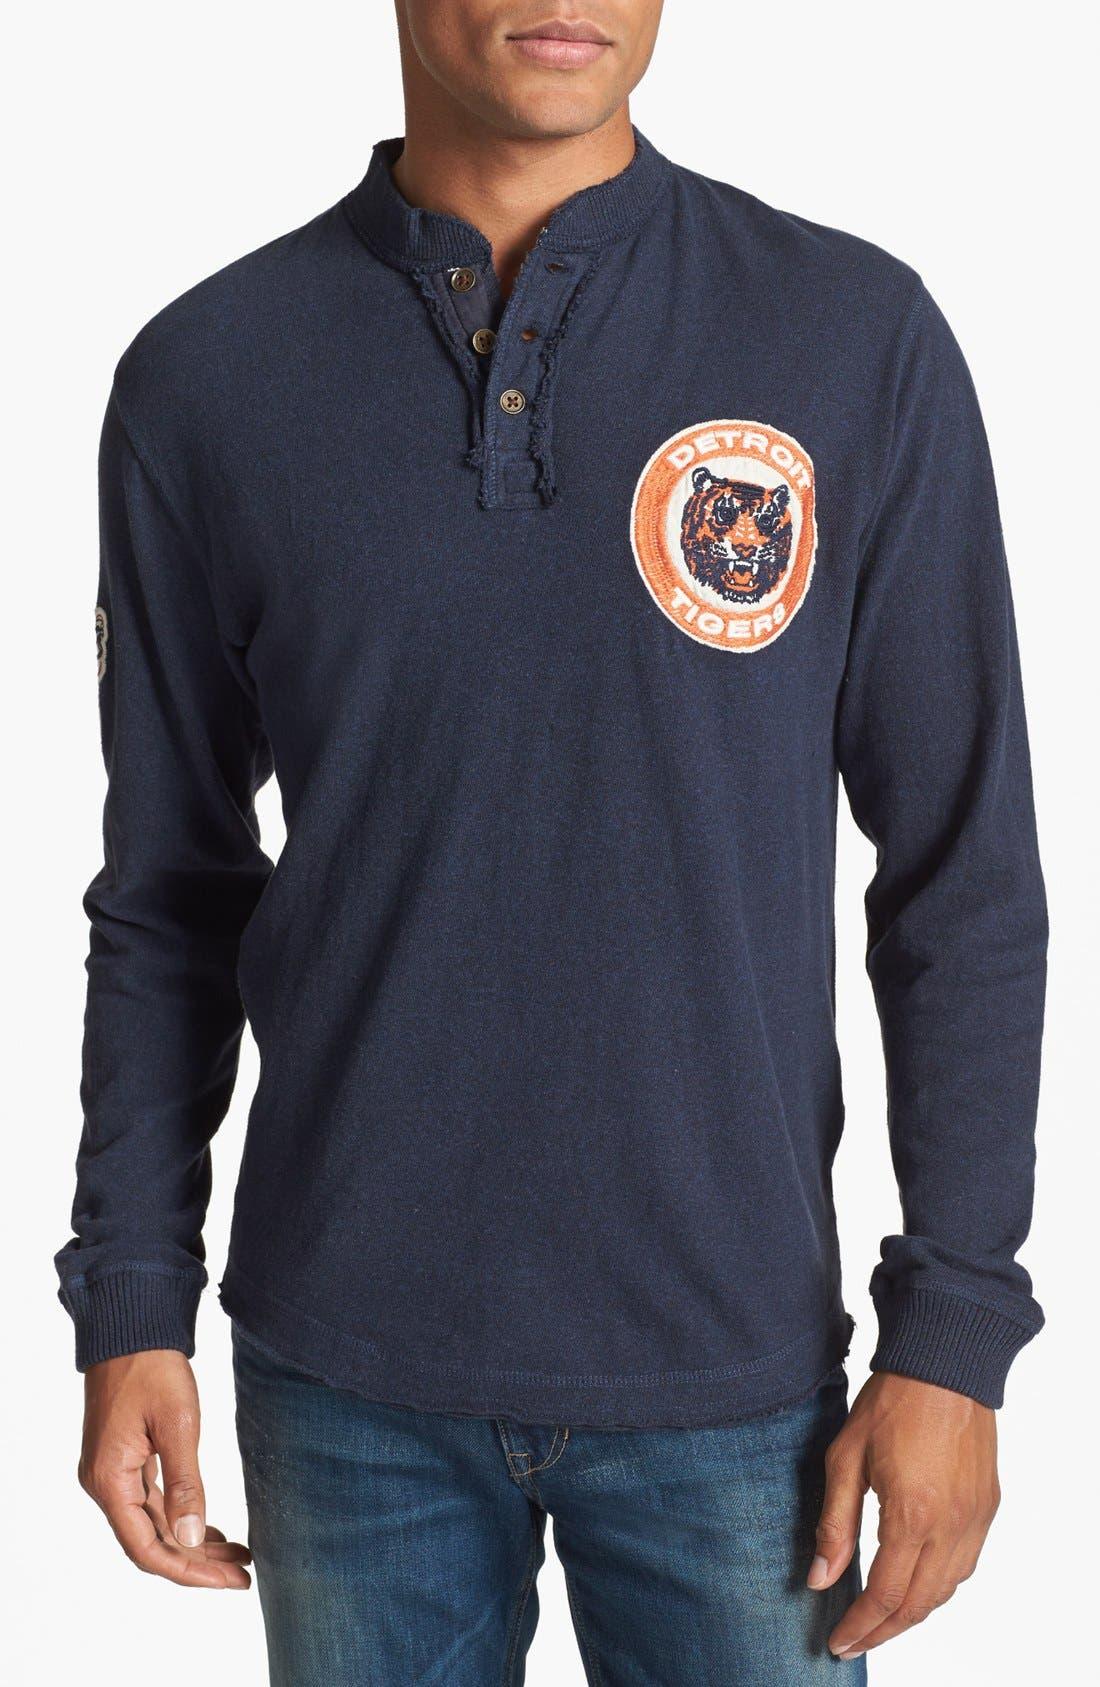 Alternate Image 1 Selected - Red Jacket 'Detroit Tigers - Ten Grand' Henley